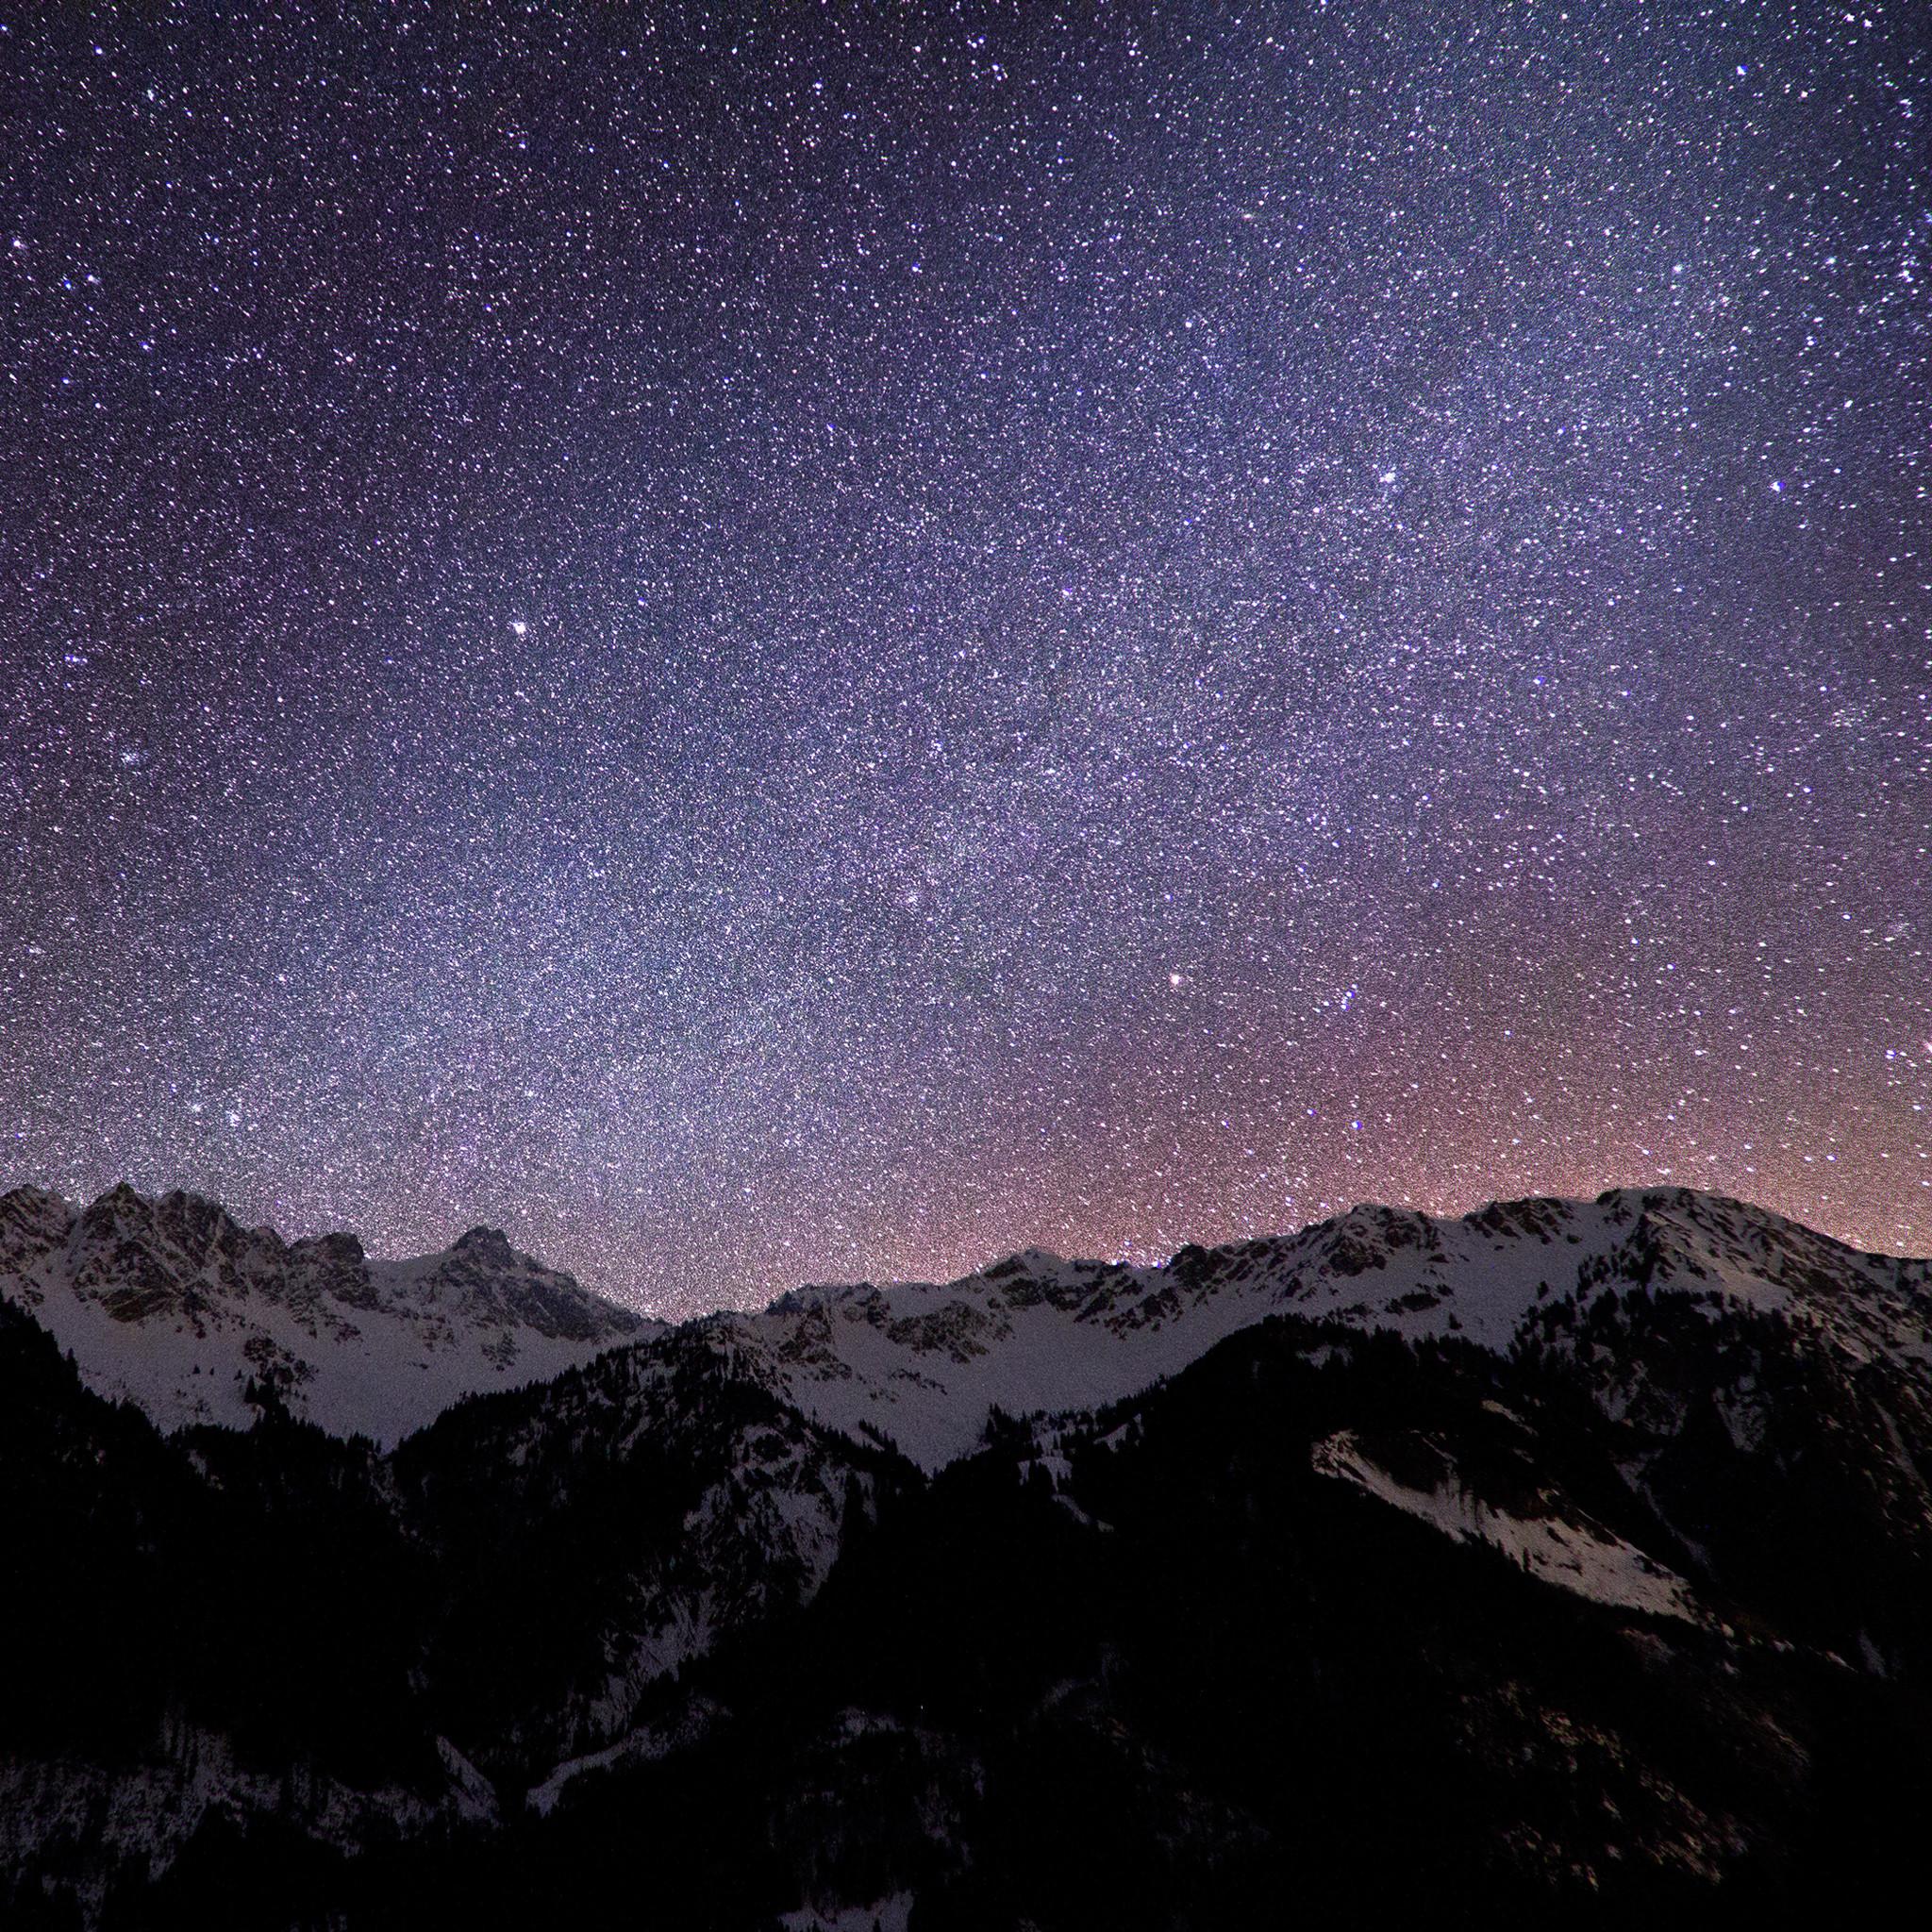 Ios Milky Way Retina Wallpaper For Ipad Air   quotekocom 2048x2048